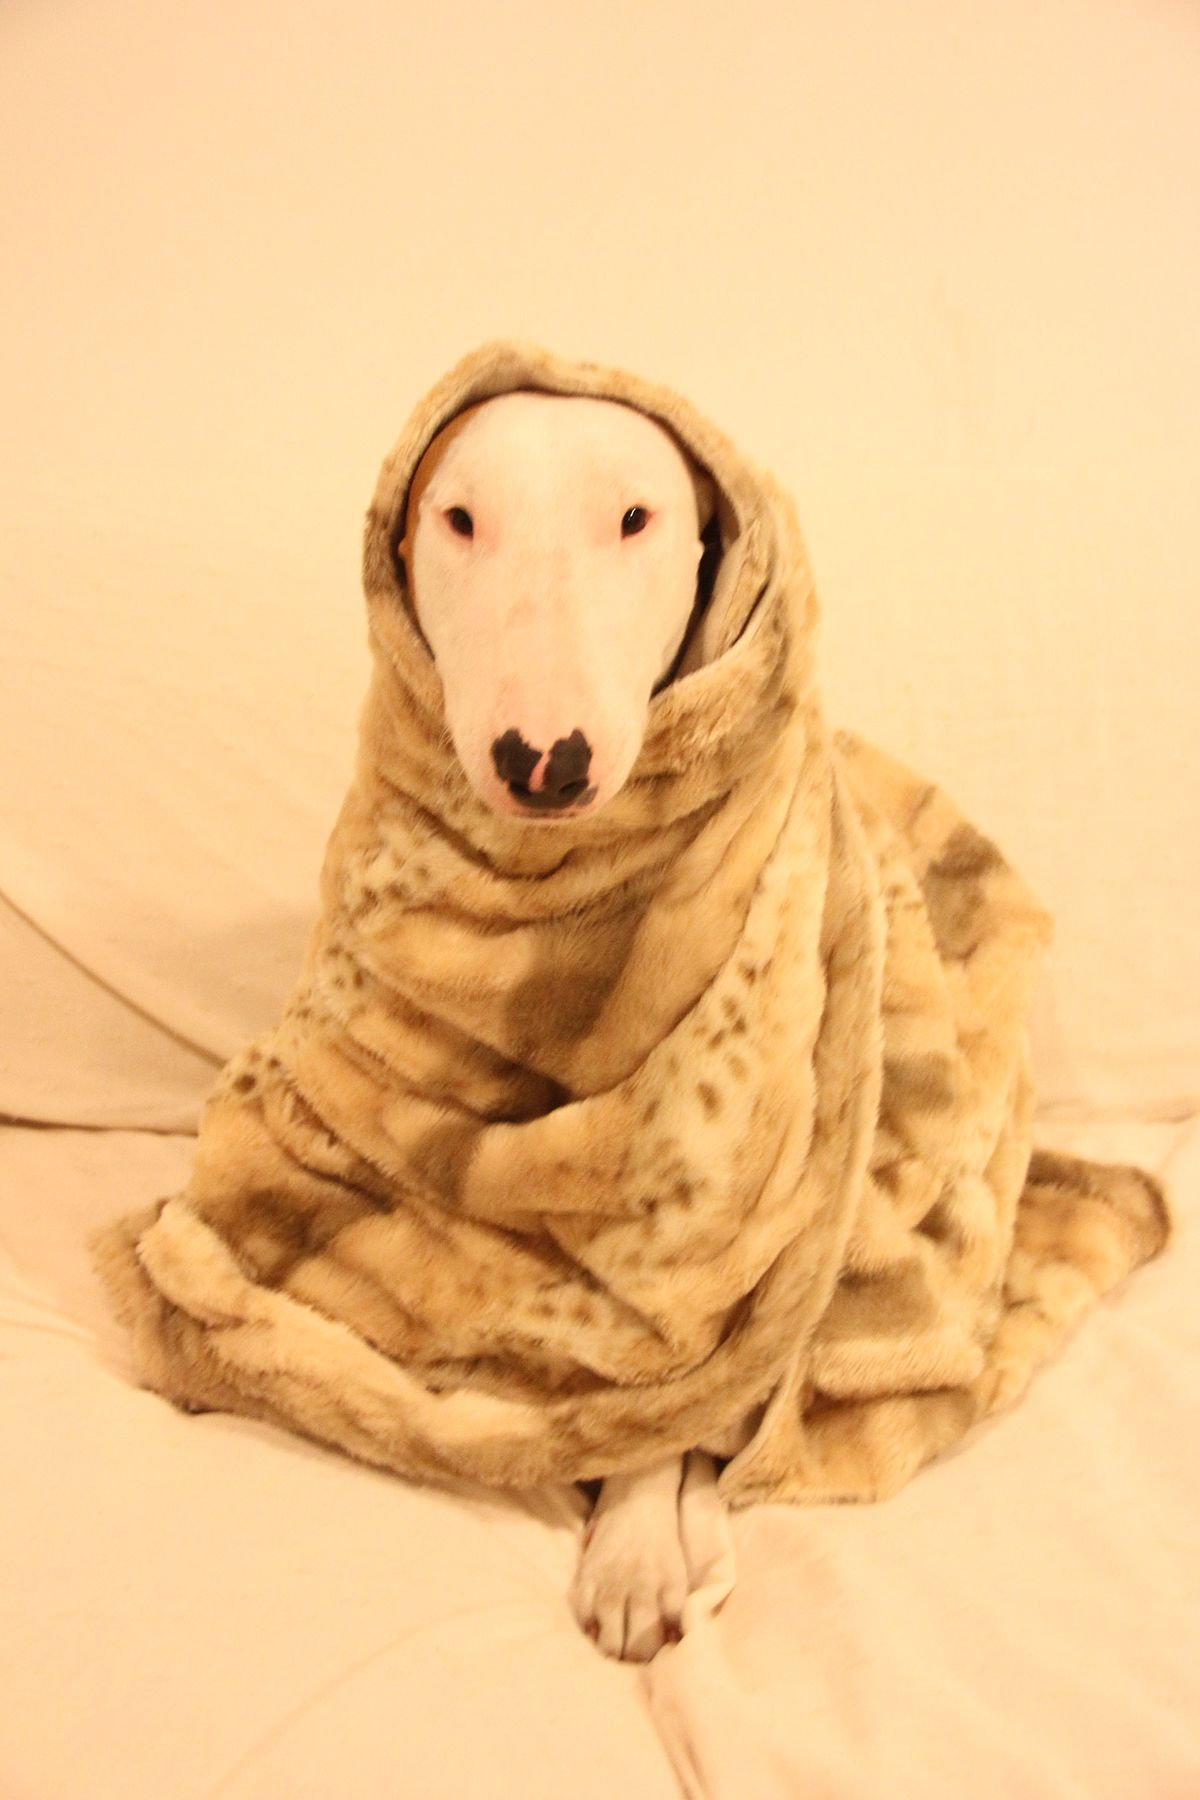 Bull terrier - Wikipedia, la enciclopedia libre